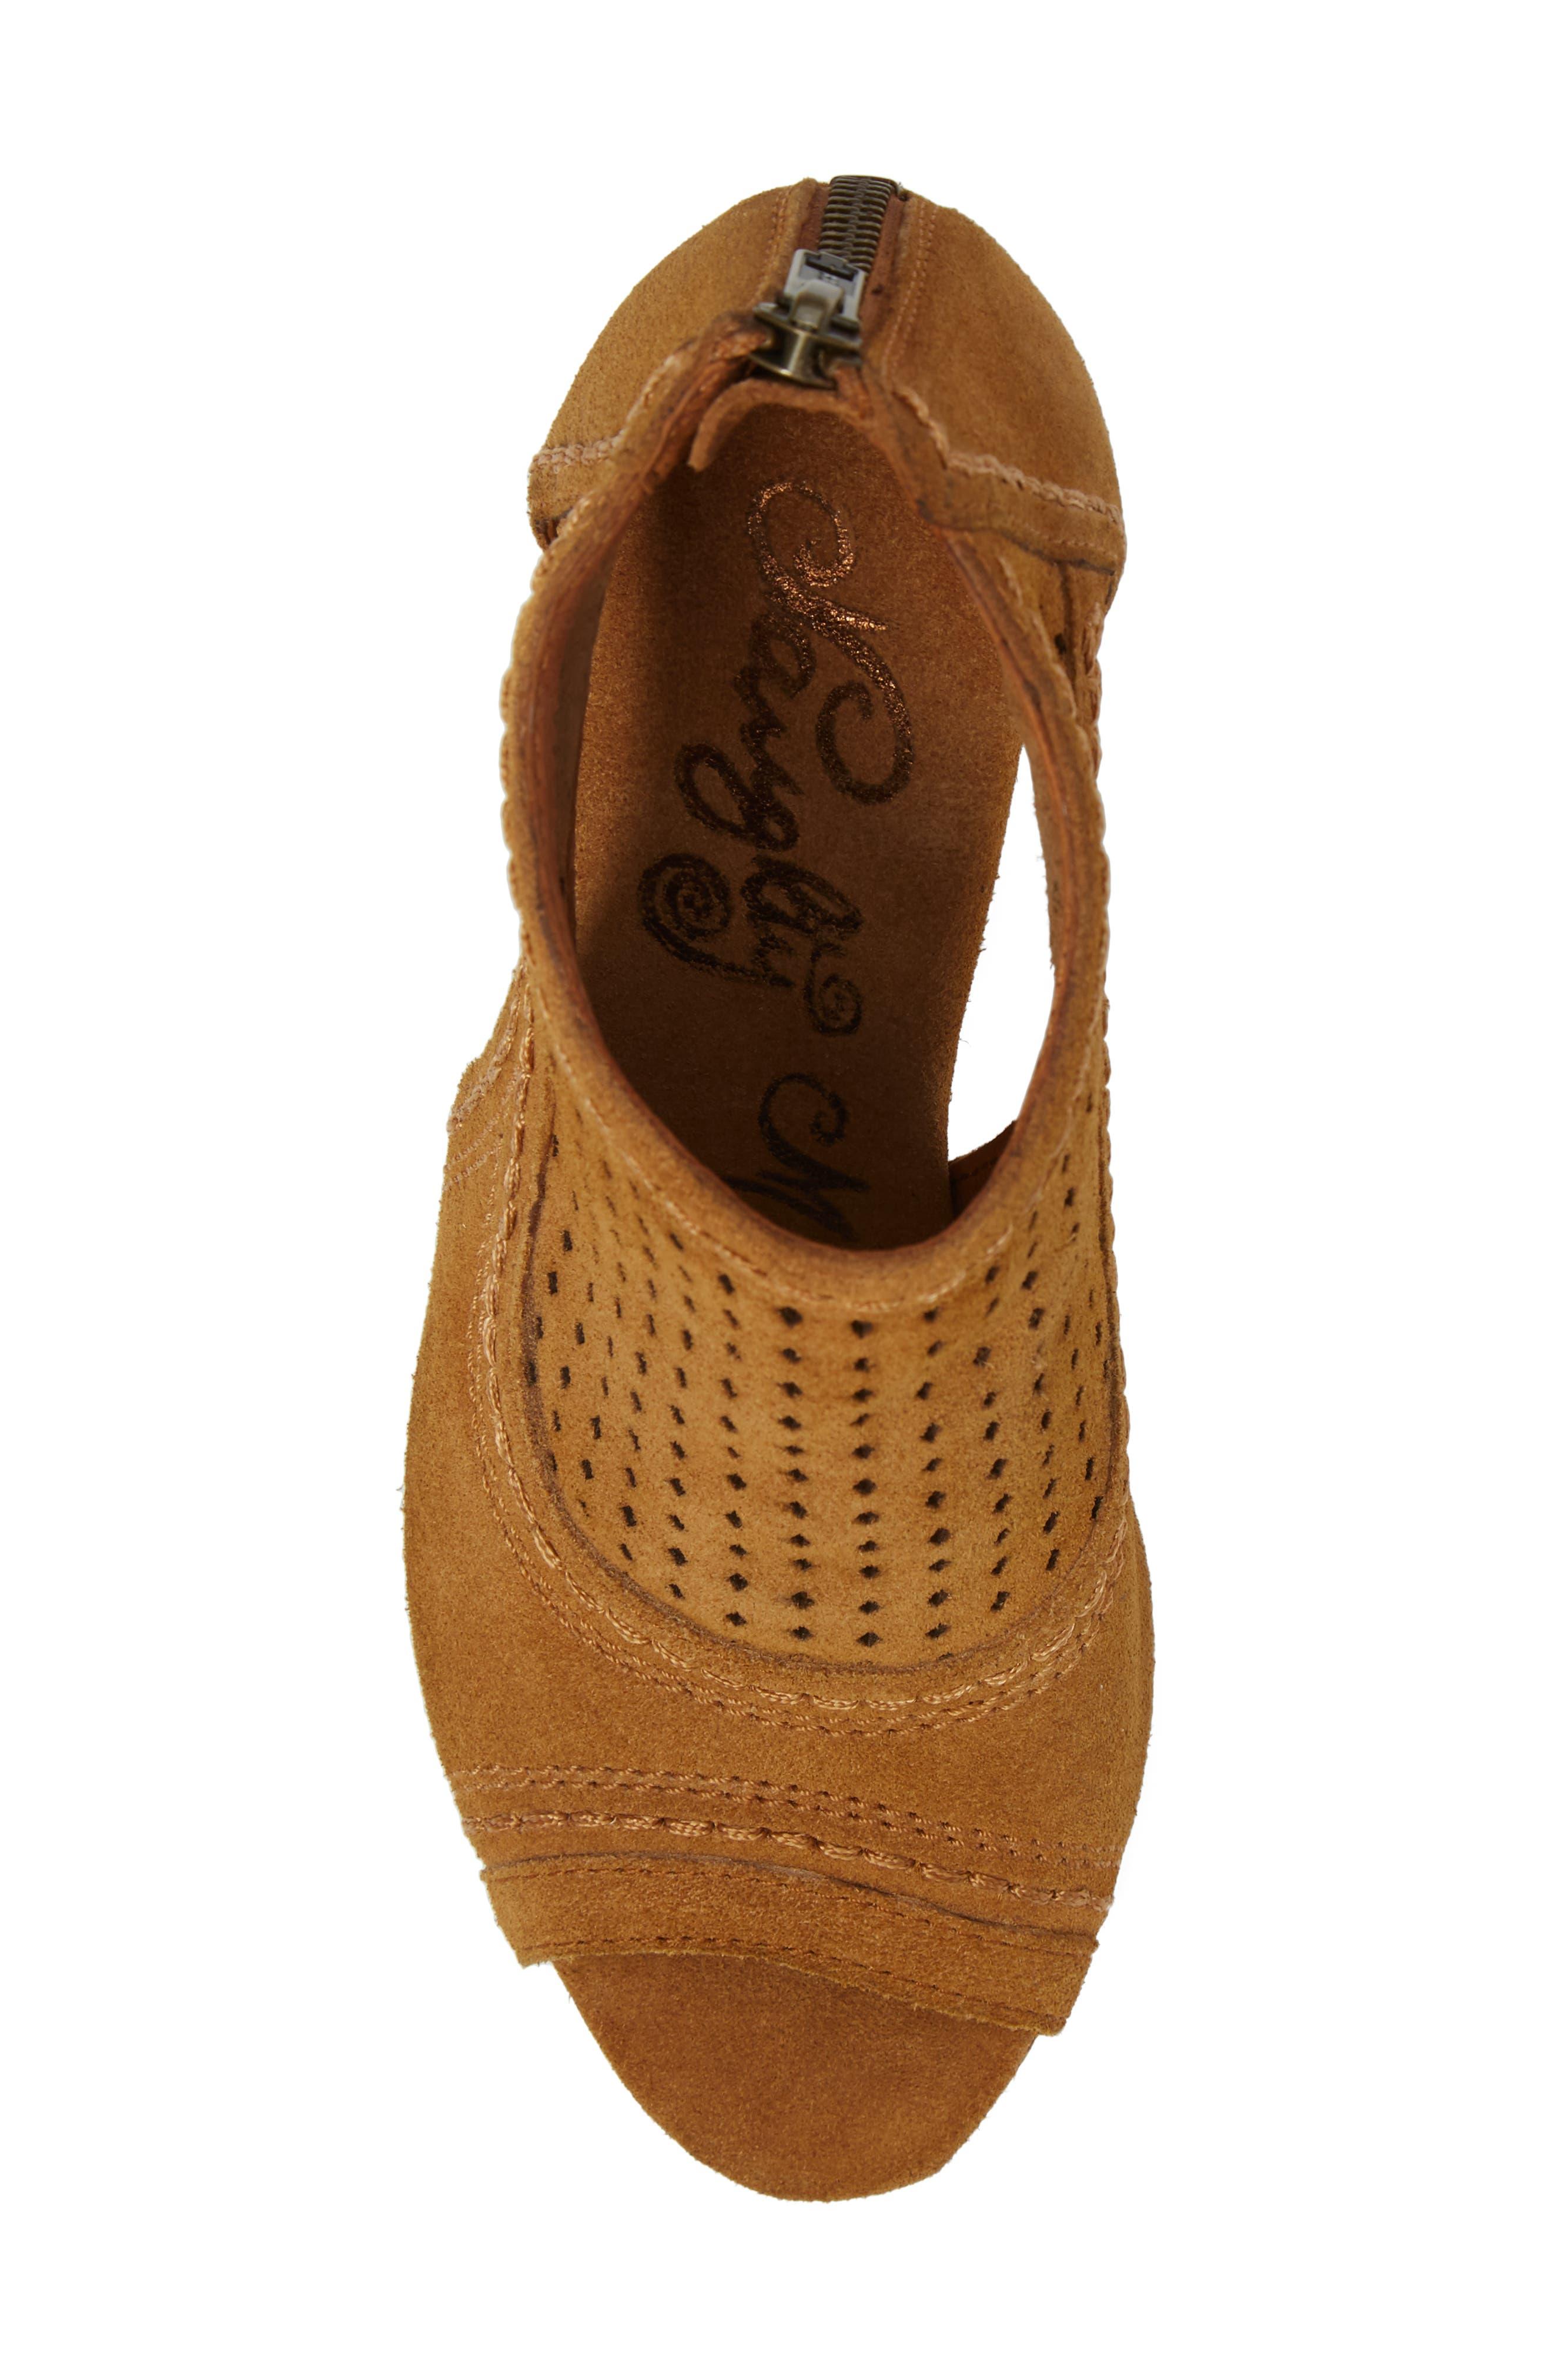 Sharon Perforated Wedge Sandal,                             Alternate thumbnail 5, color,                             249